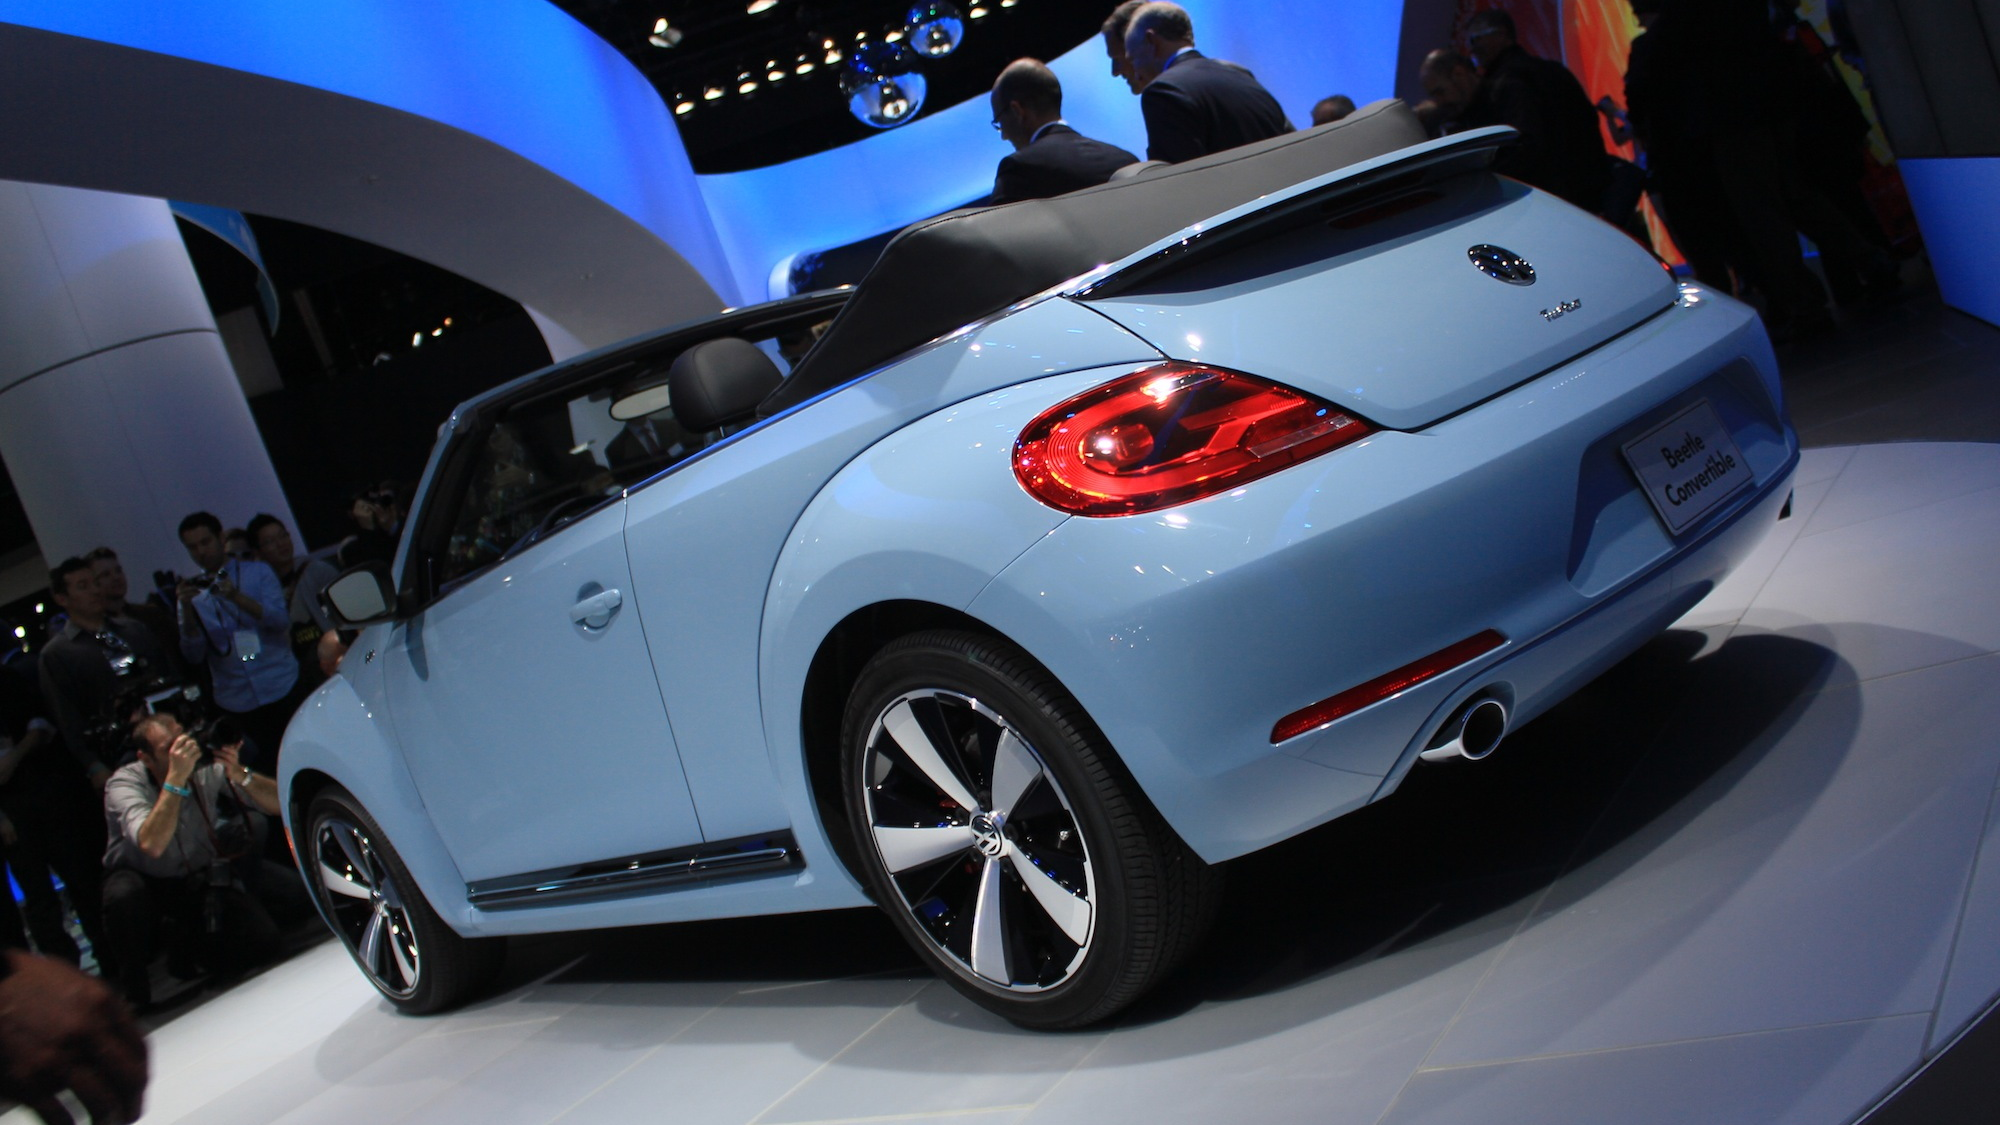 2013 Volkswagen Beetle Convertible live photos, 2012 L.A. Auto Show